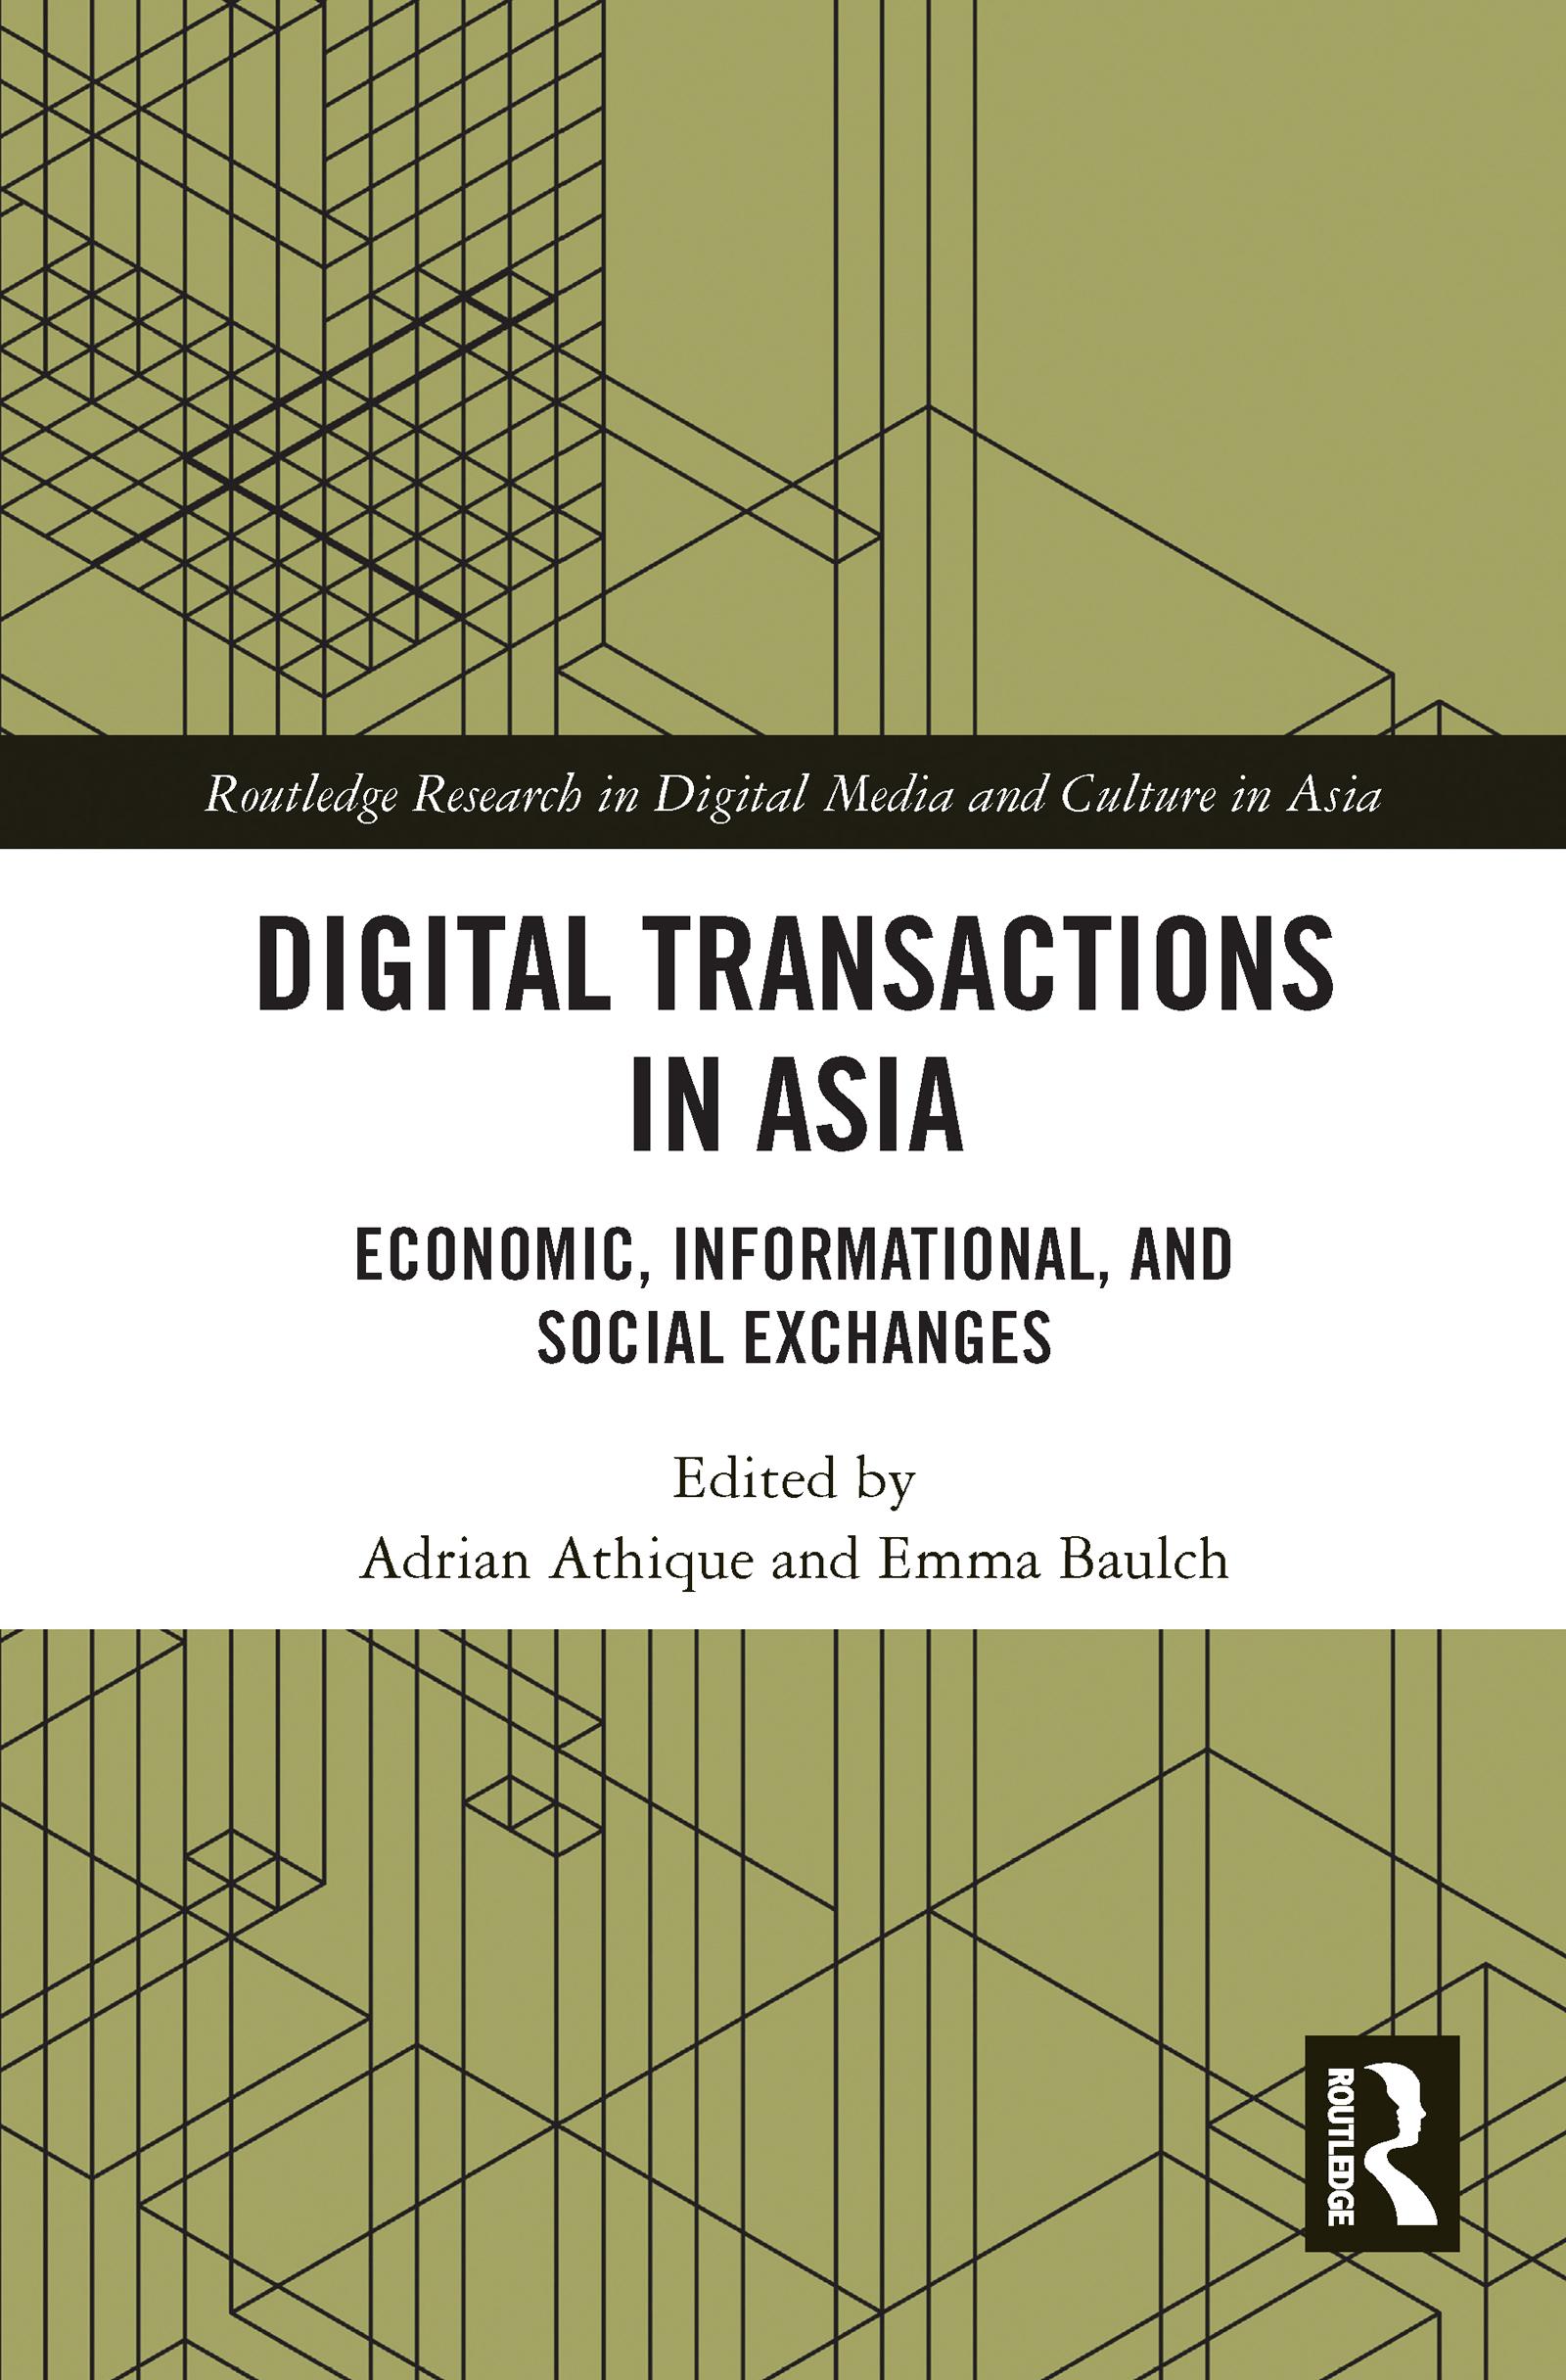 Digital Transactions in Asia